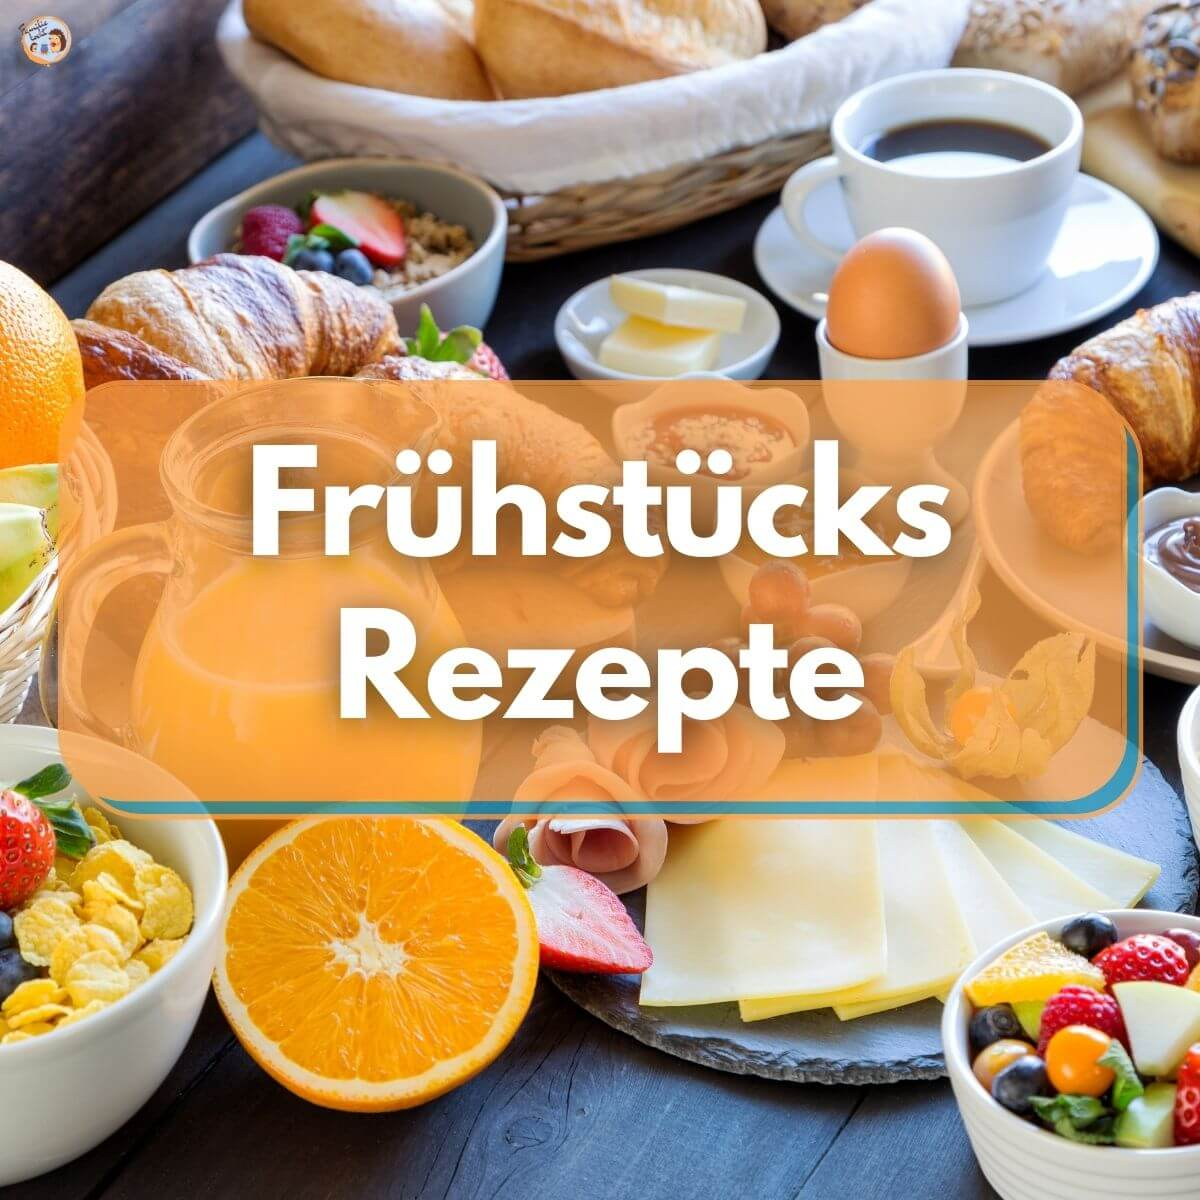 Frühstücks Rezepte